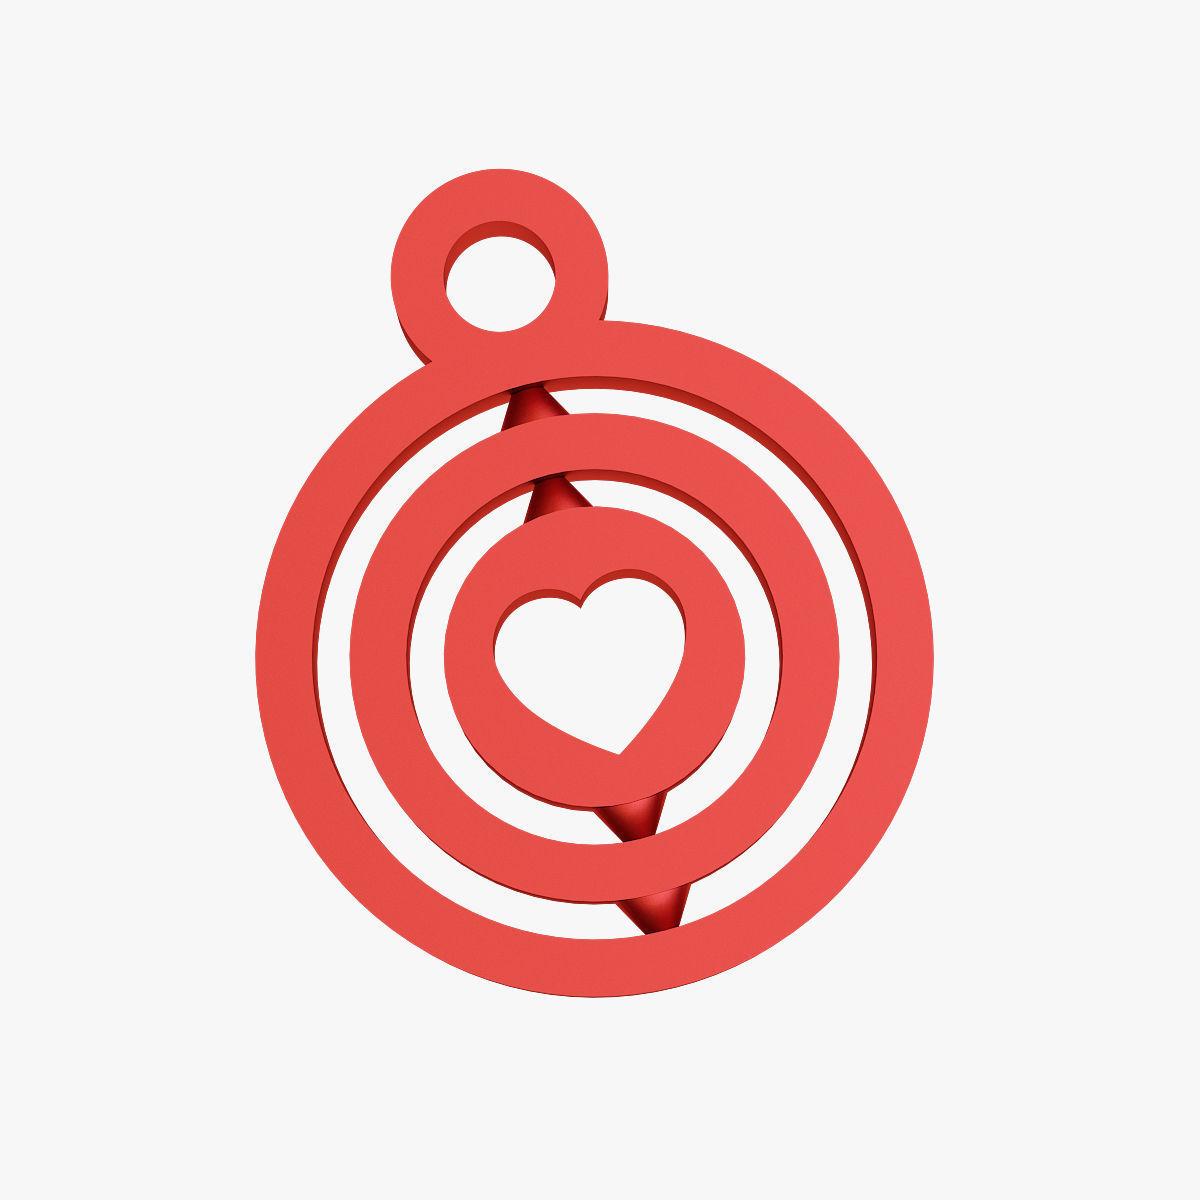 Heart symbol keychain